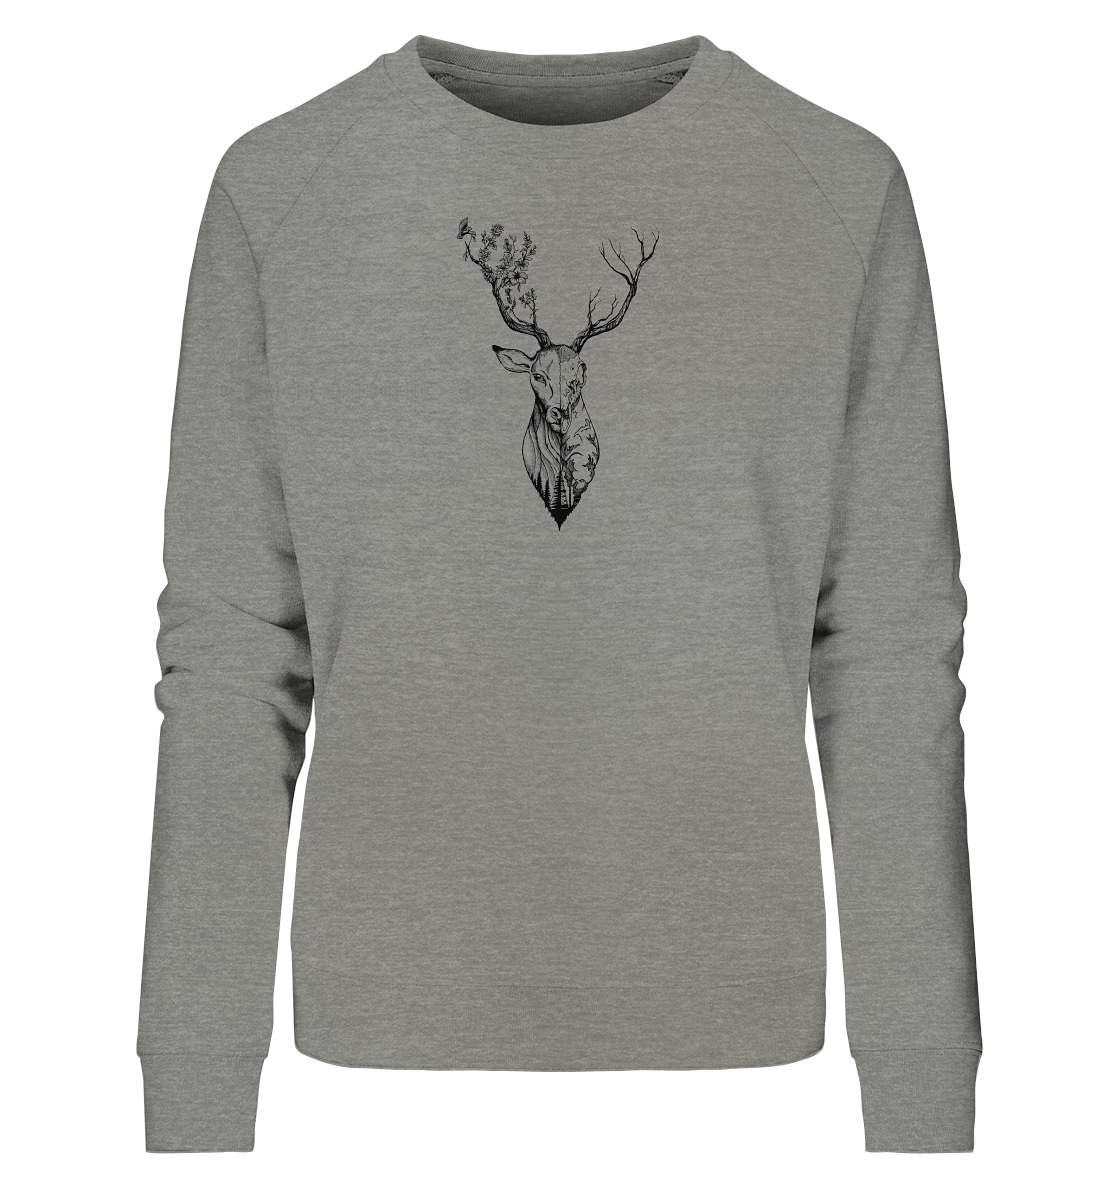 front-ladies-organic-sweatshirt-818381-1116x-14.png